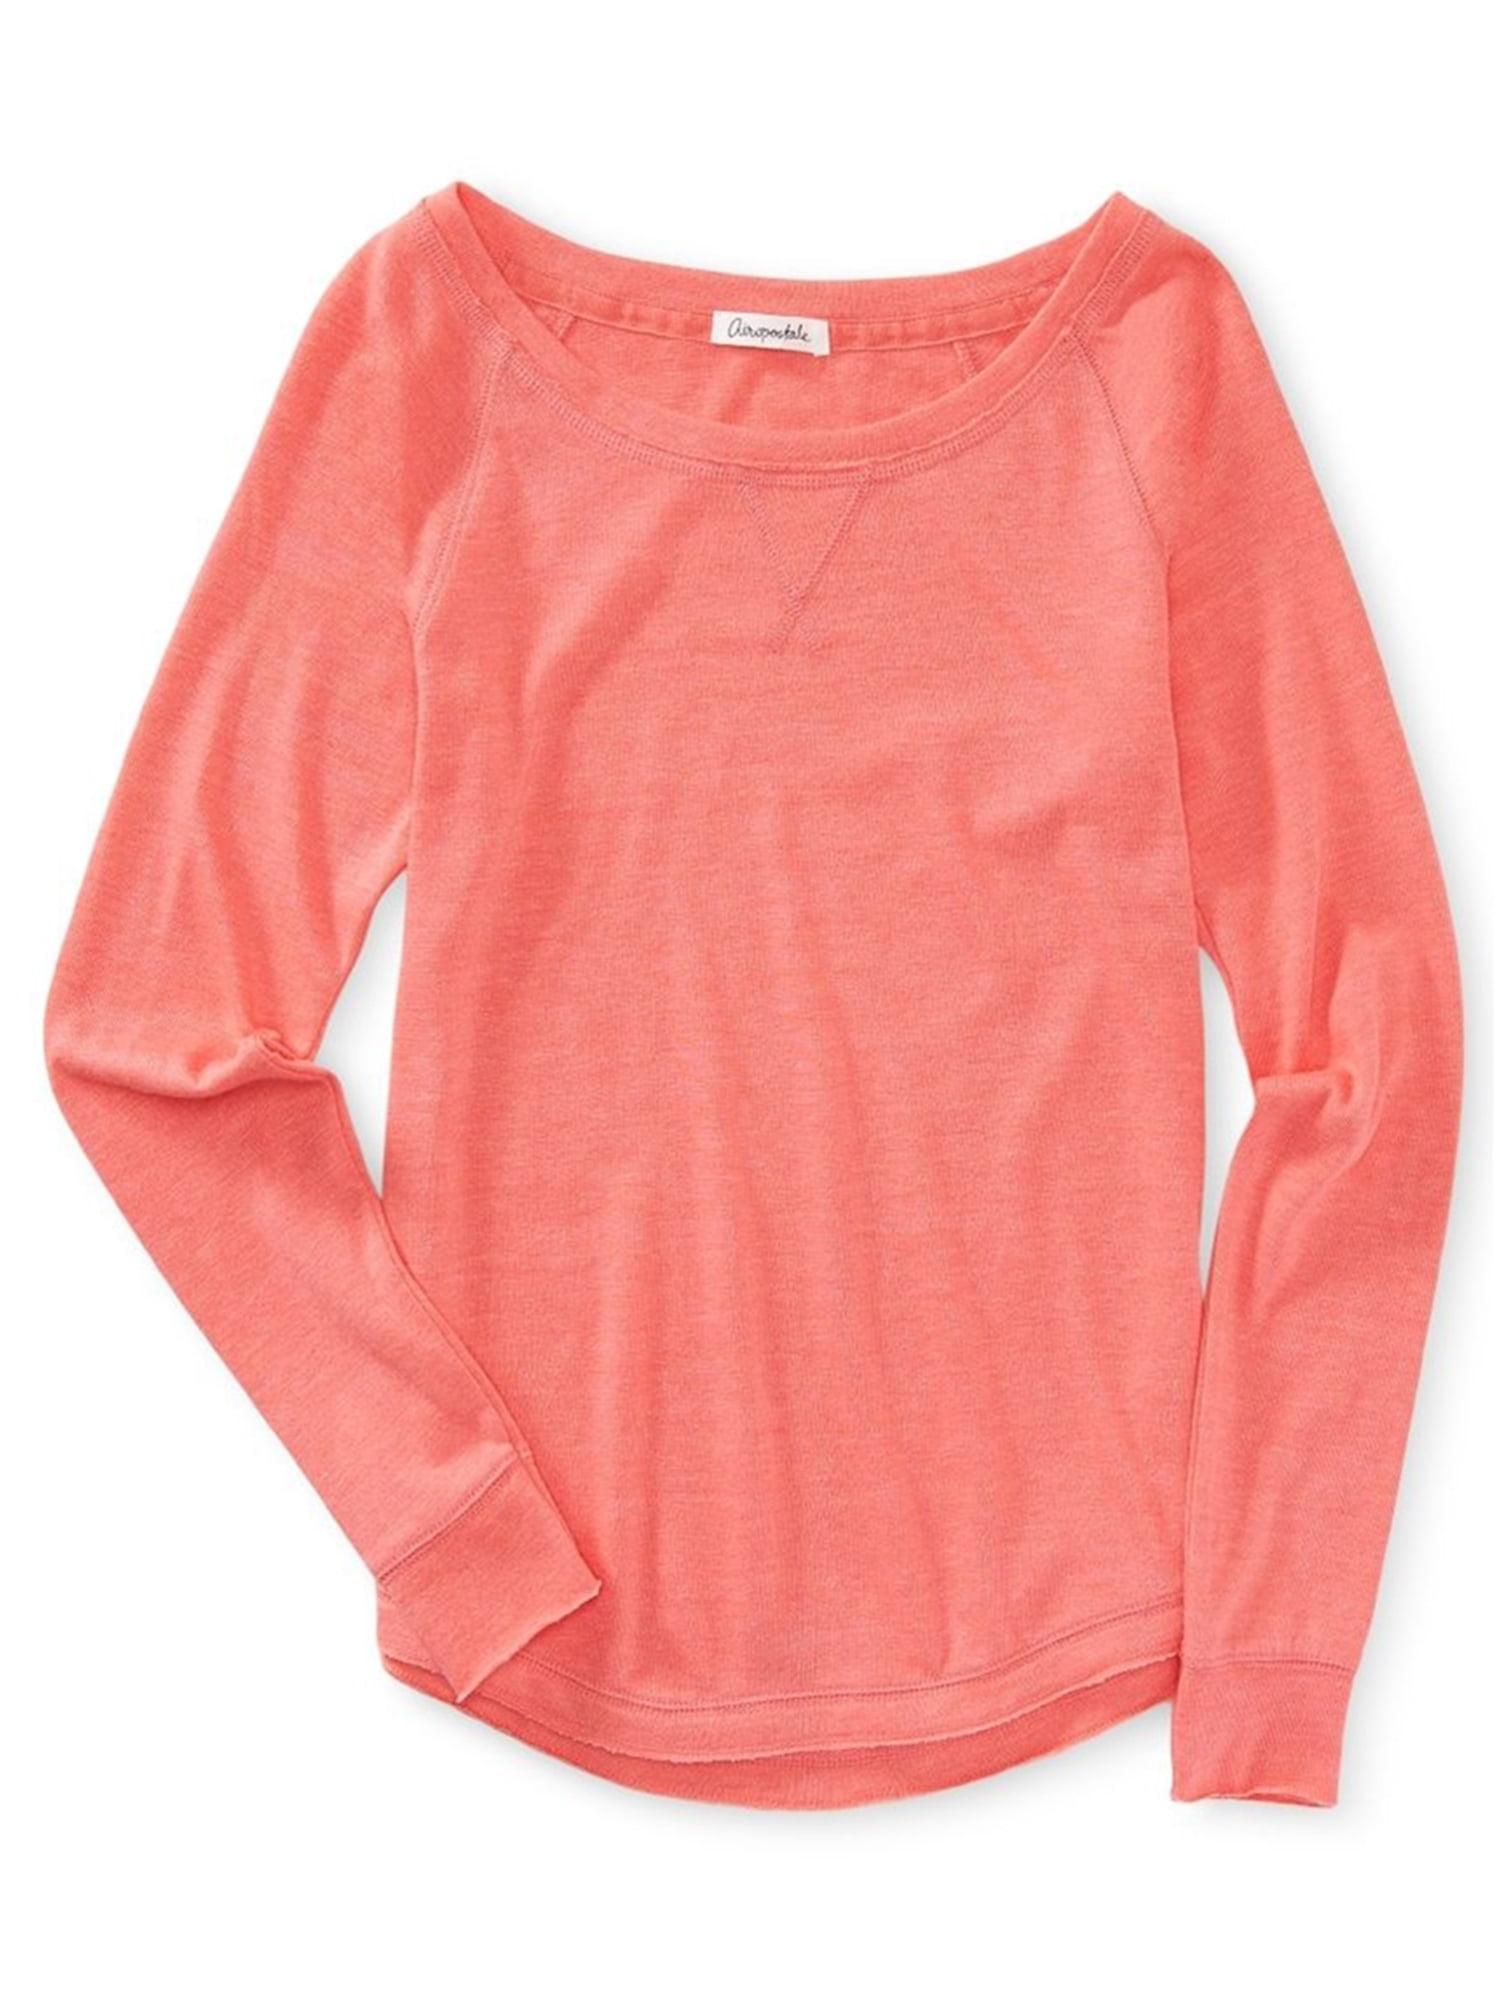 Aeropostale Juniors Solid Raglan Sweatshirt